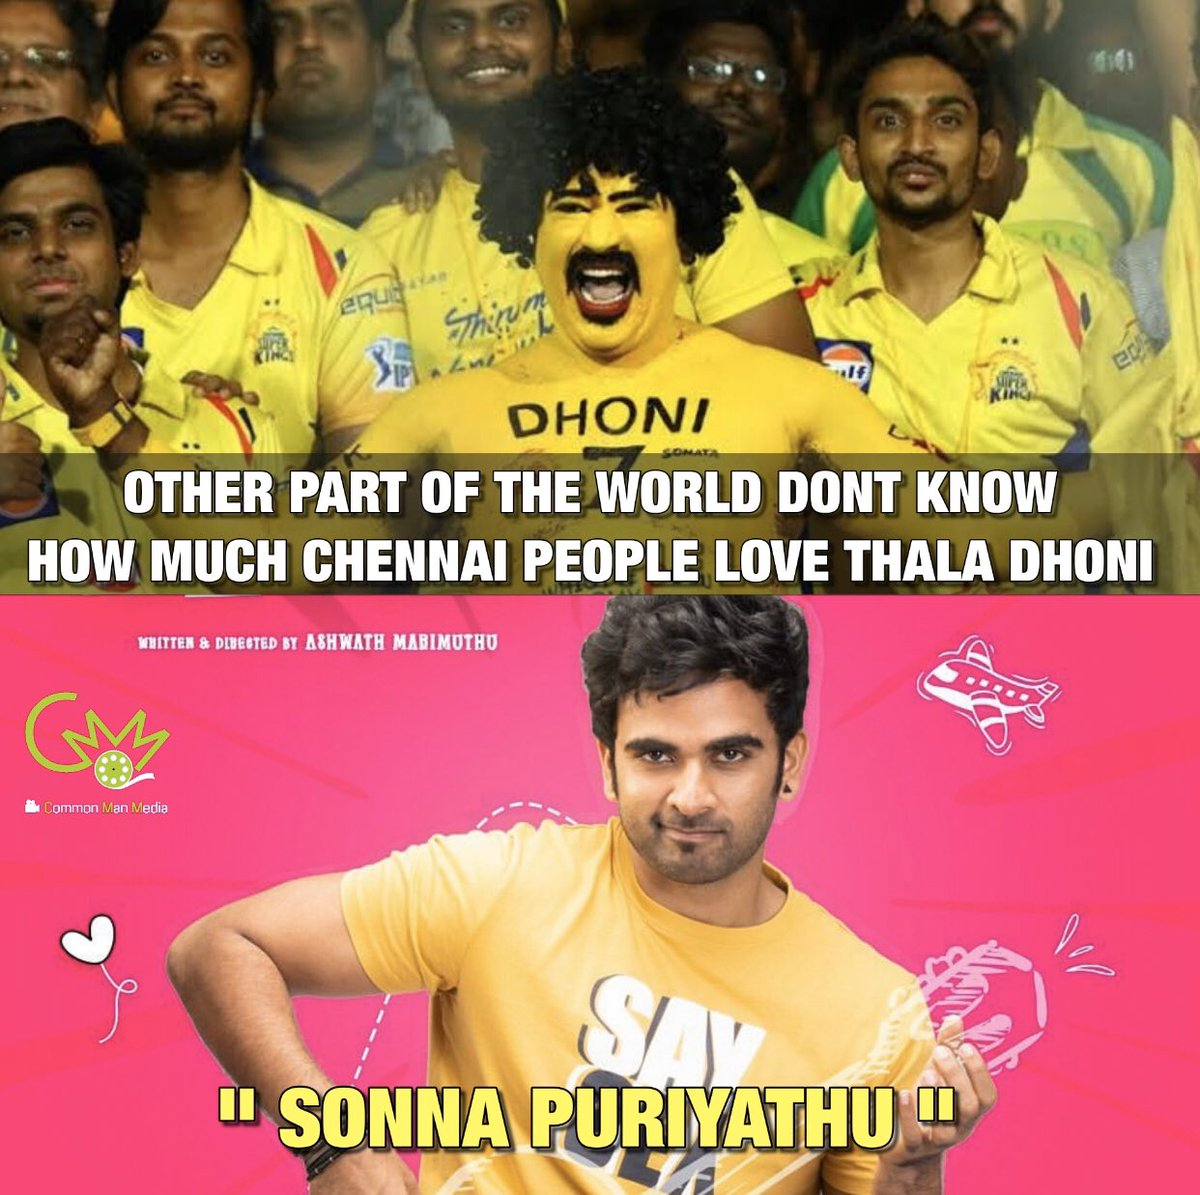 #IPL #MSDhoni #CSK #OhMyKadavule  @AshokSelvan @msdhoni @ritika_offl @leon_james @vanibhojanoffl @ChennaiIPL